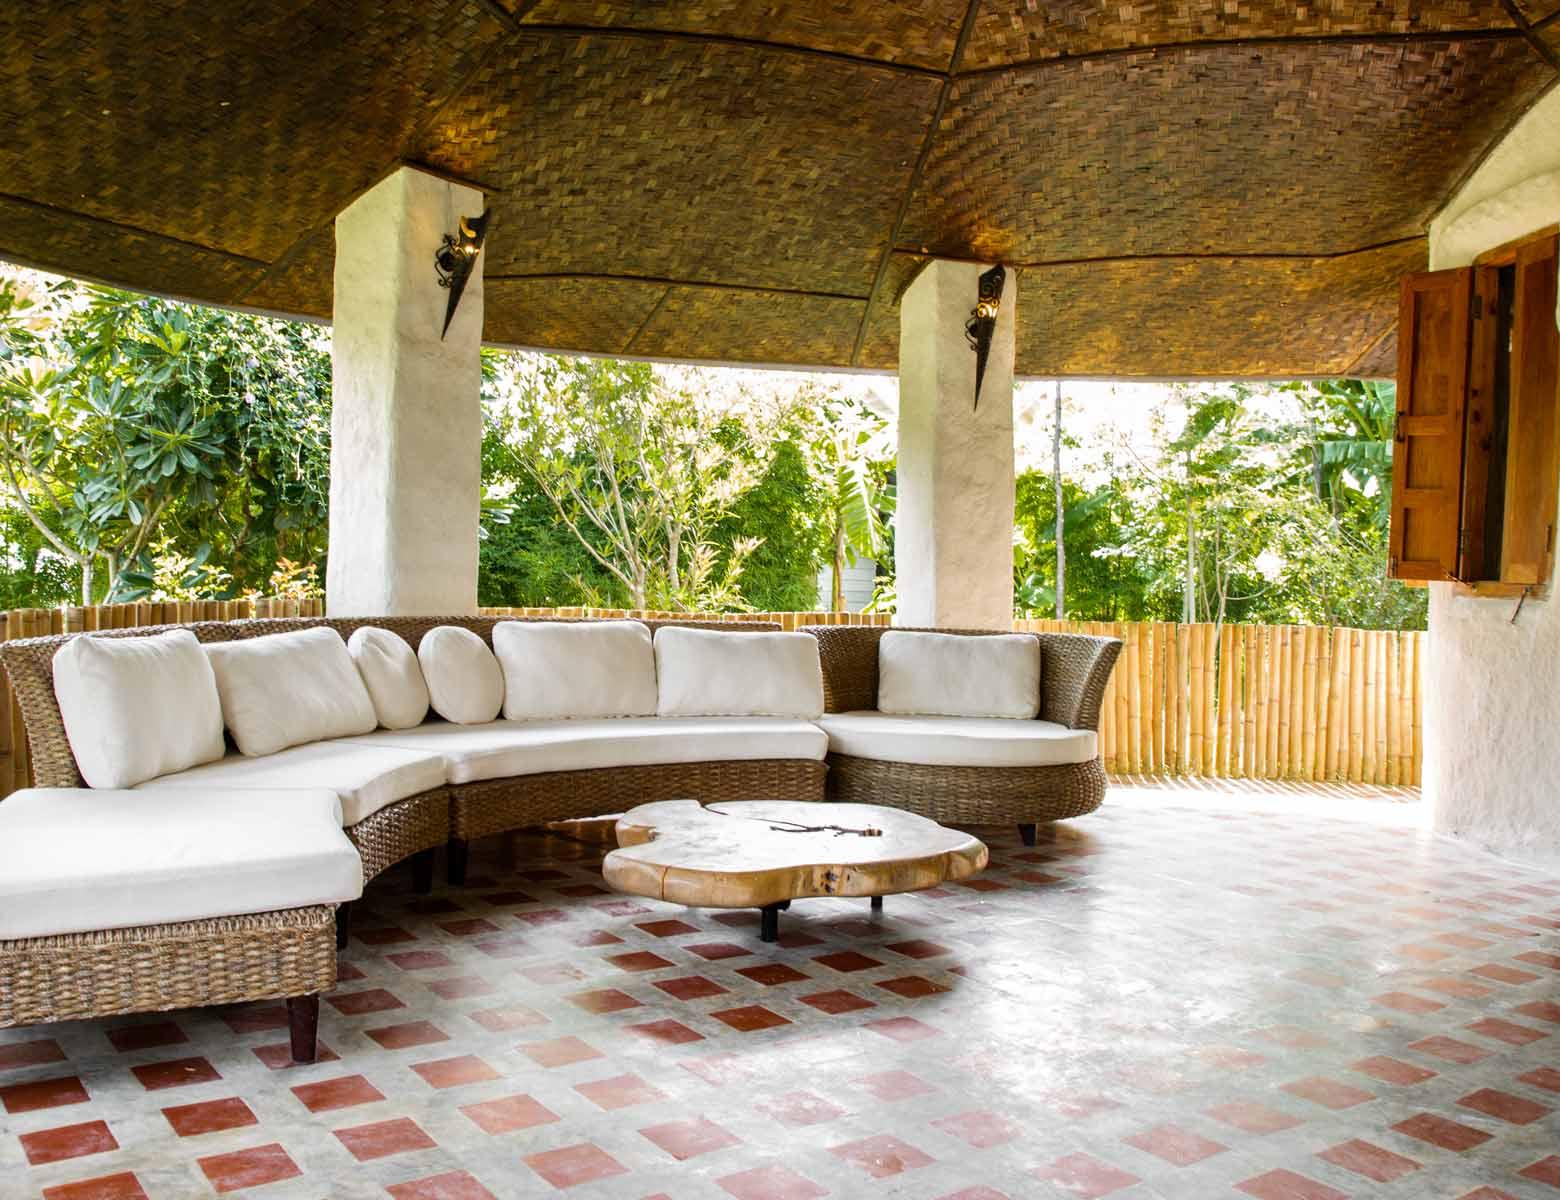 Chiang Mai Yoga Retreat Center Adobe Villa